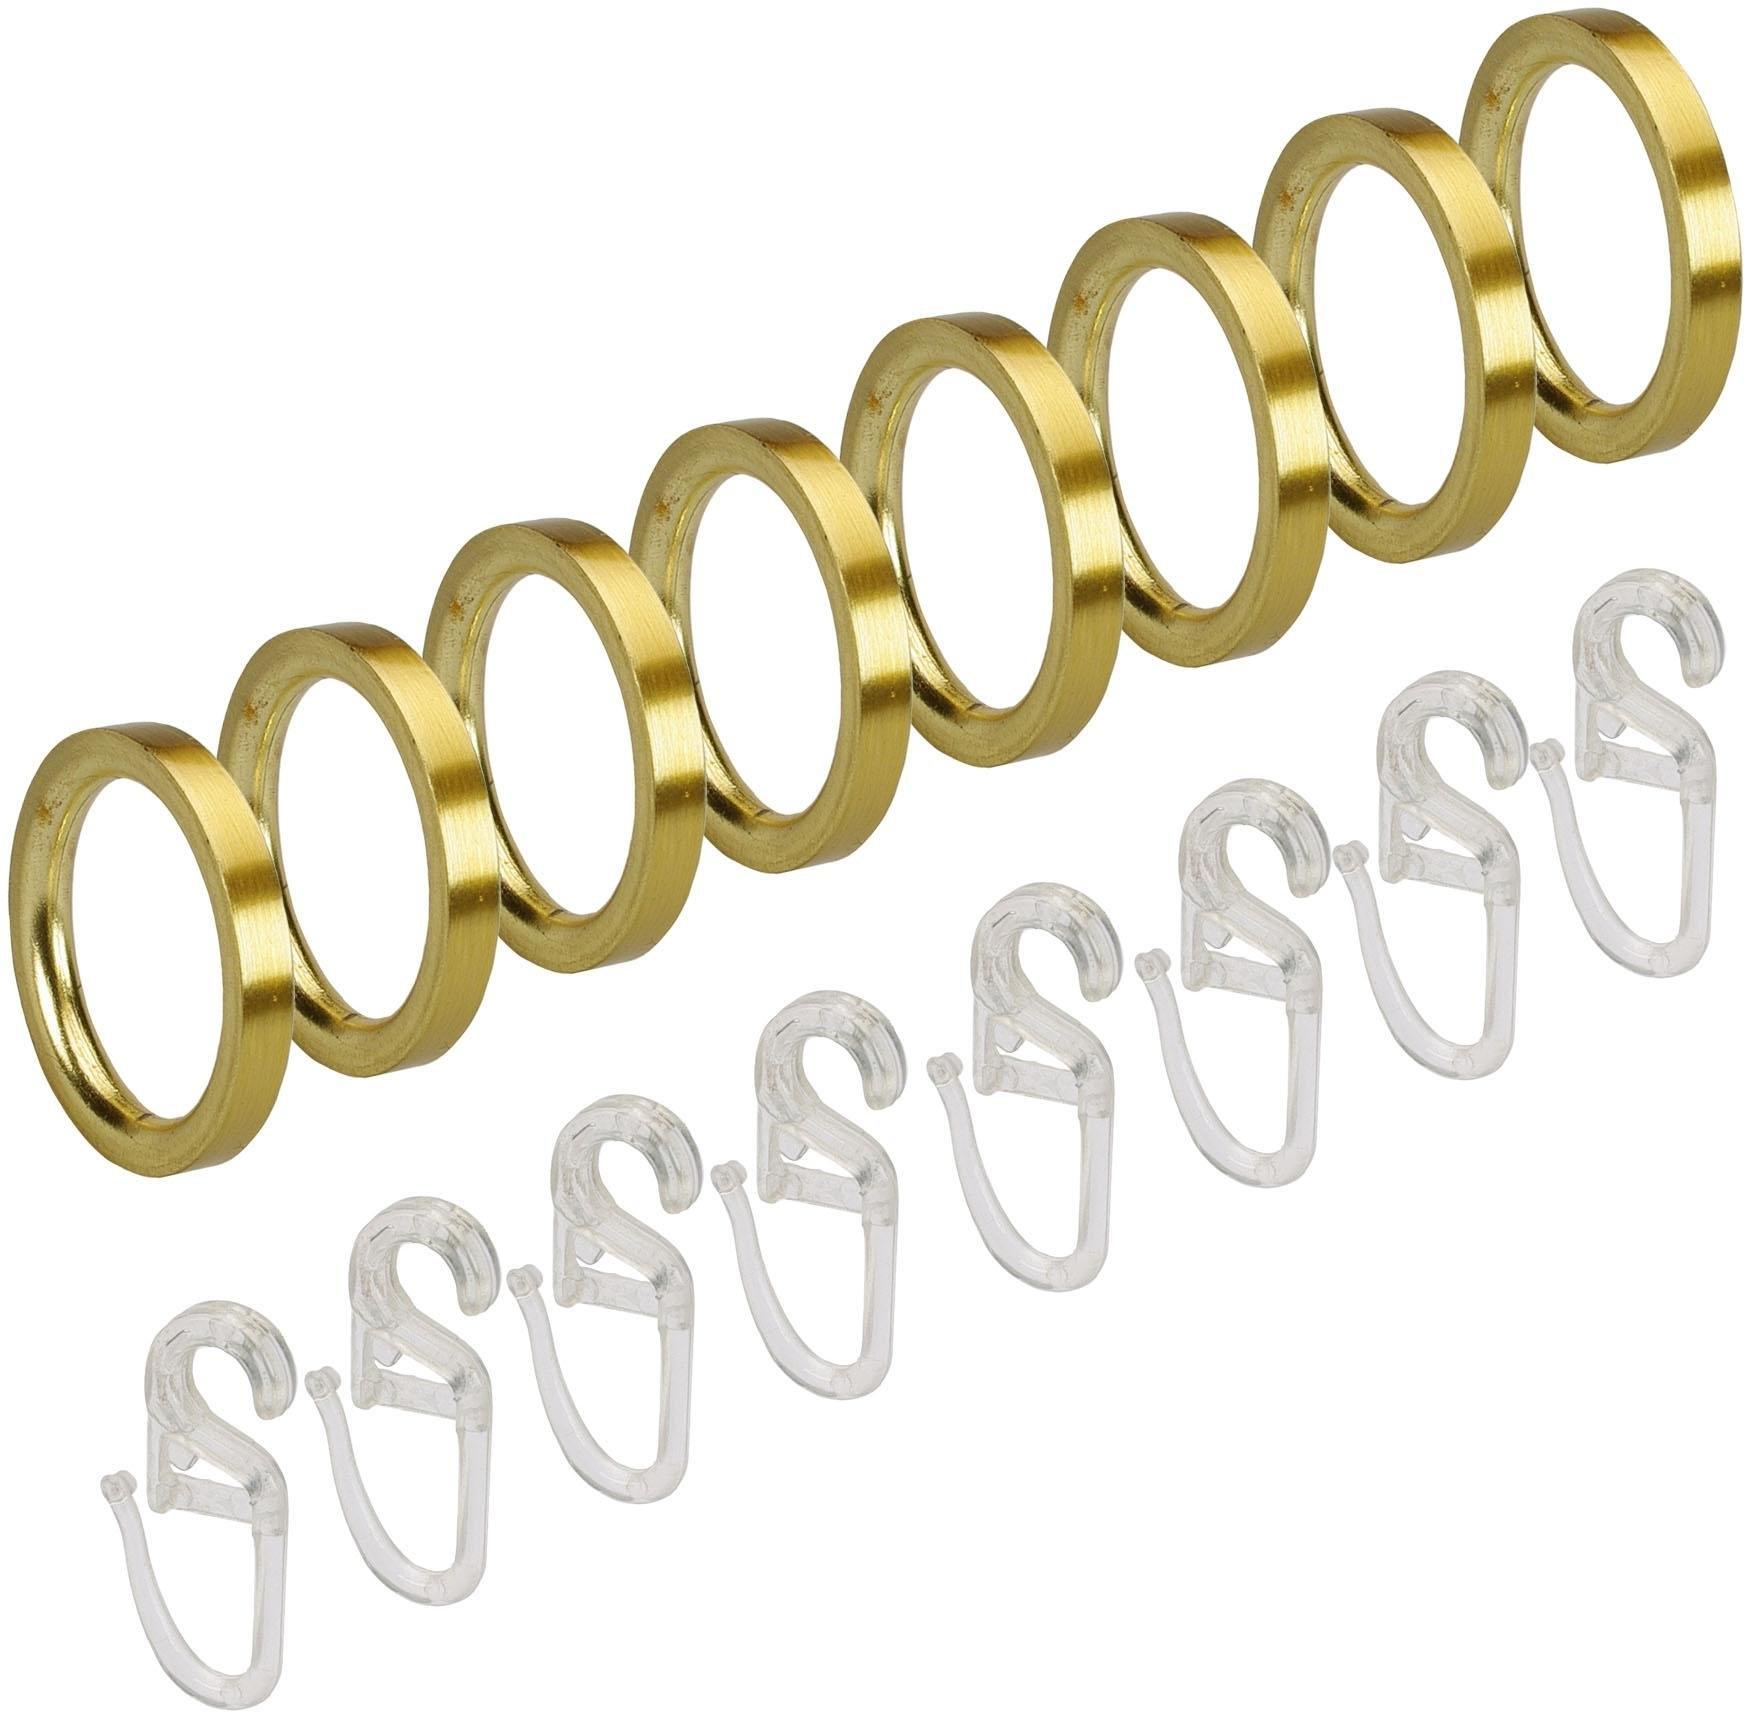 Liedeco Gordijnring voor gordijnroeden ø 16 mm (set, 8 stuks) - verschillende betaalmethodes